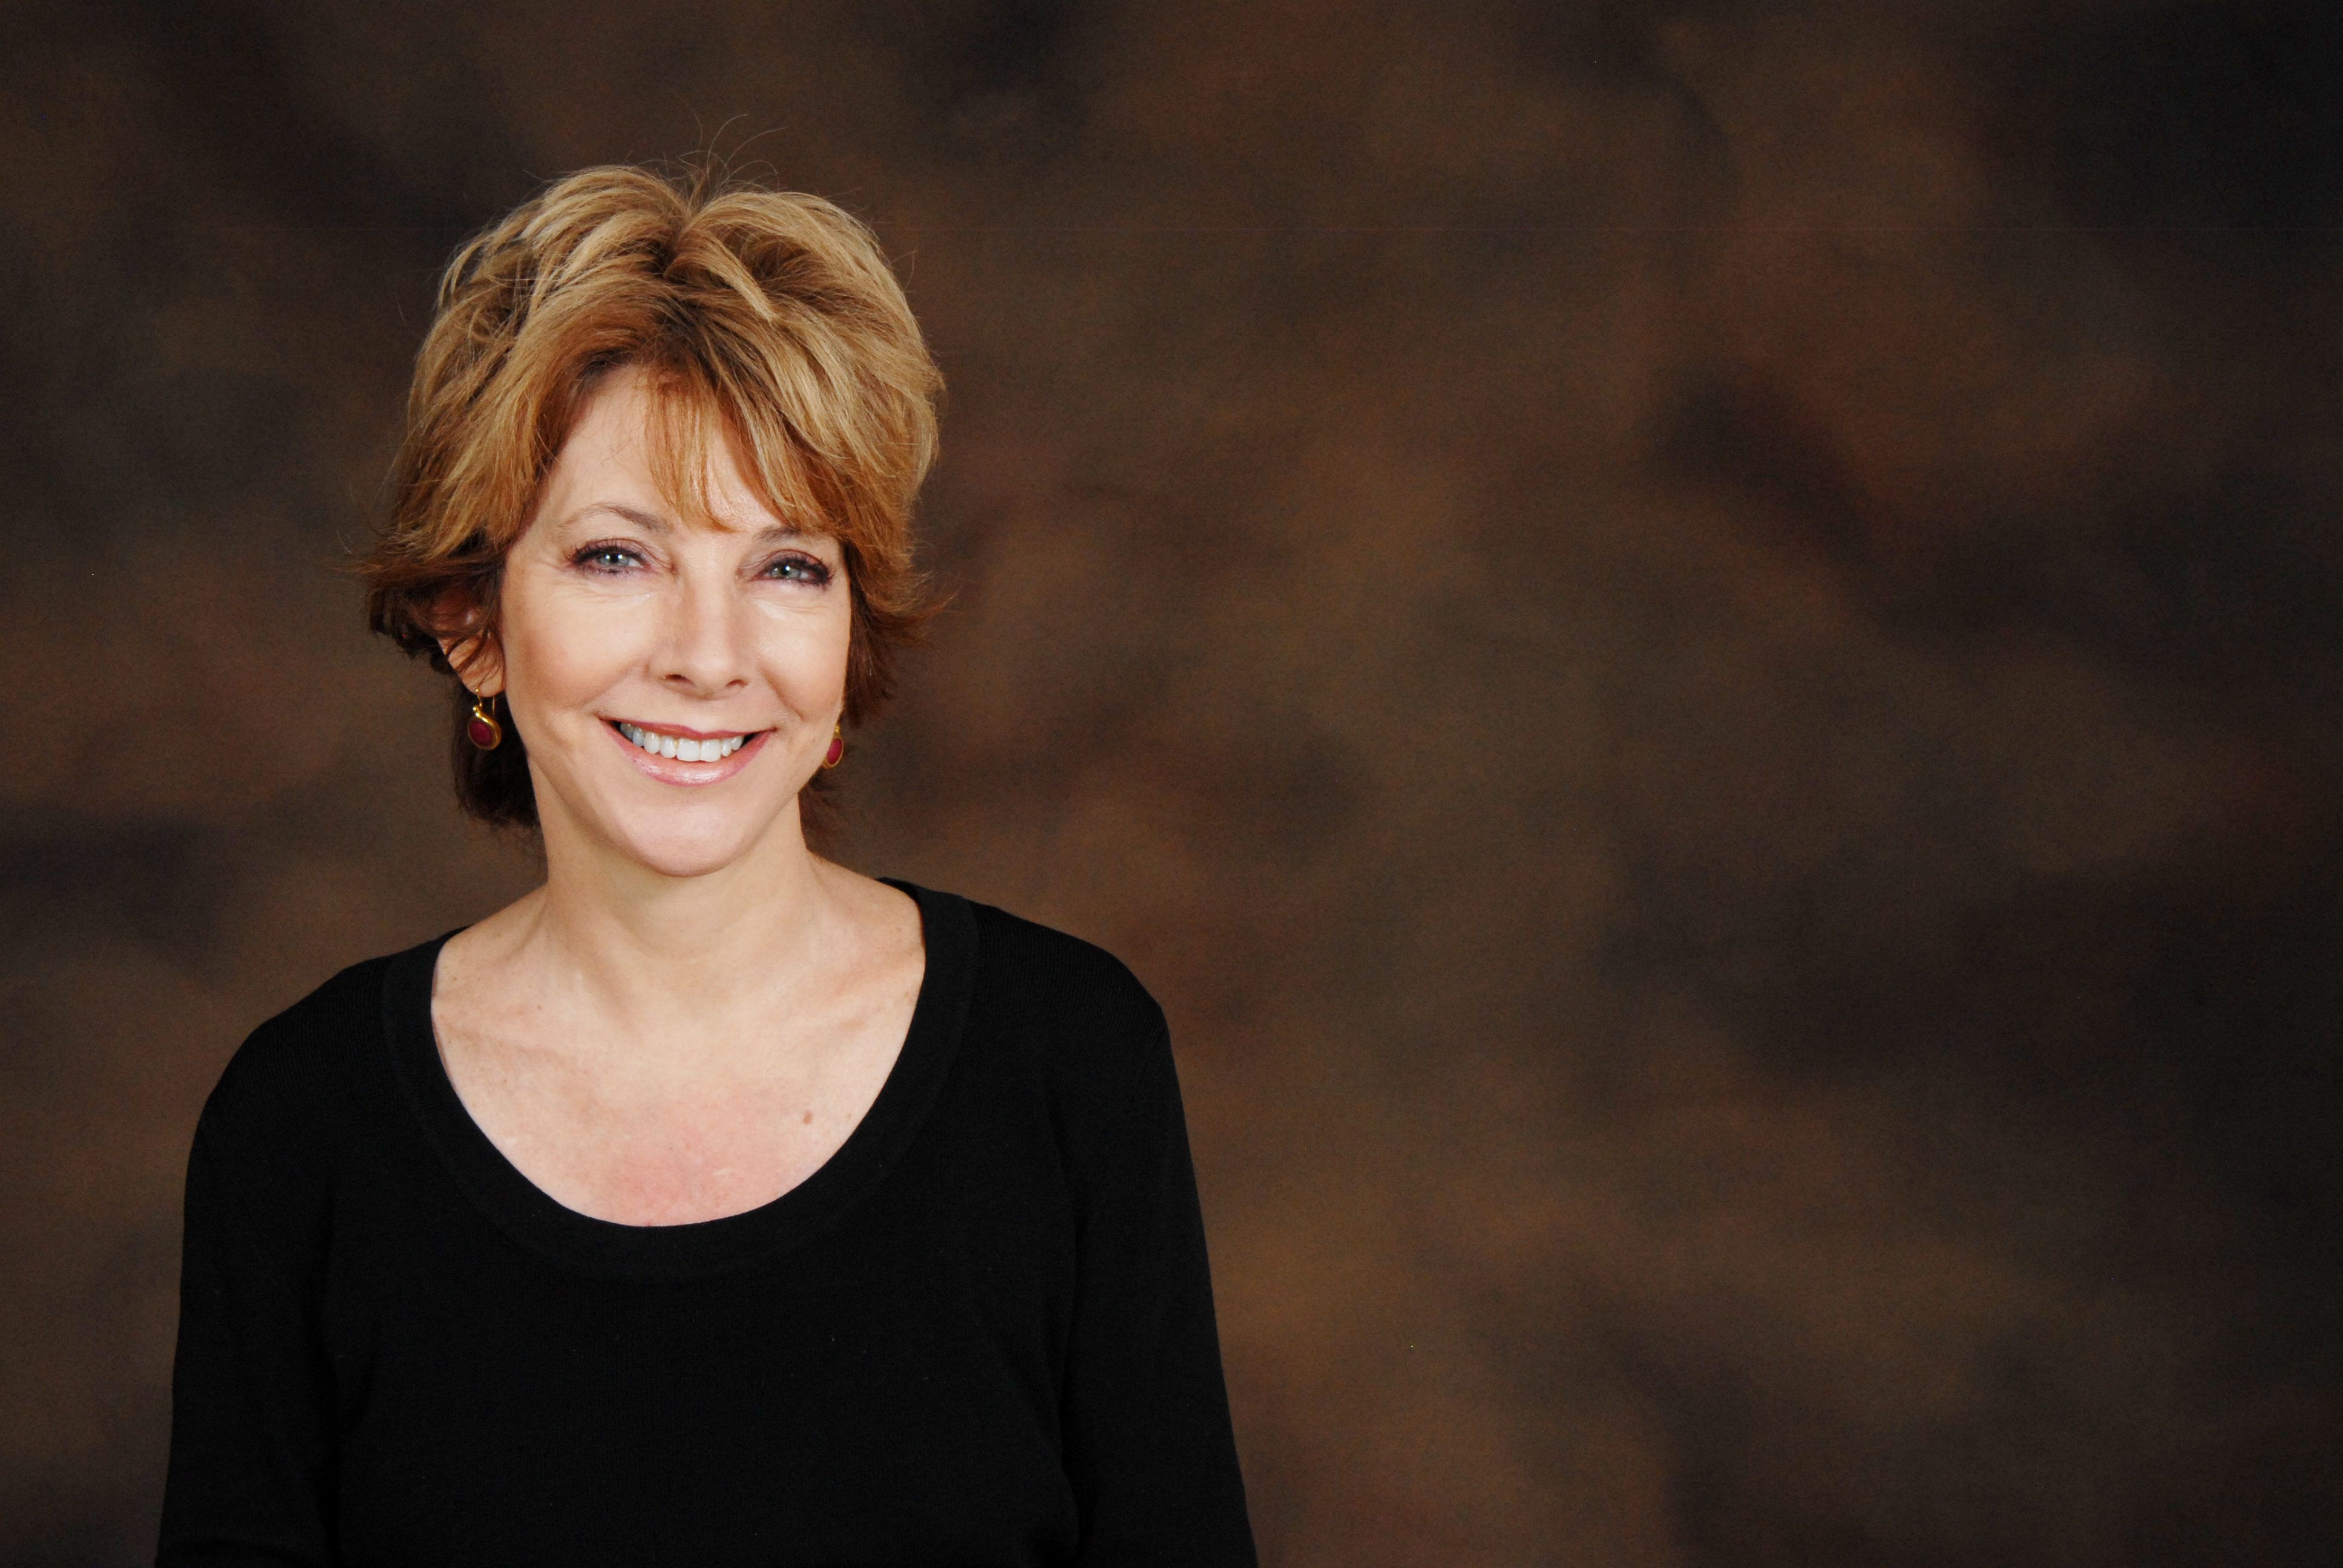 Sally Satel